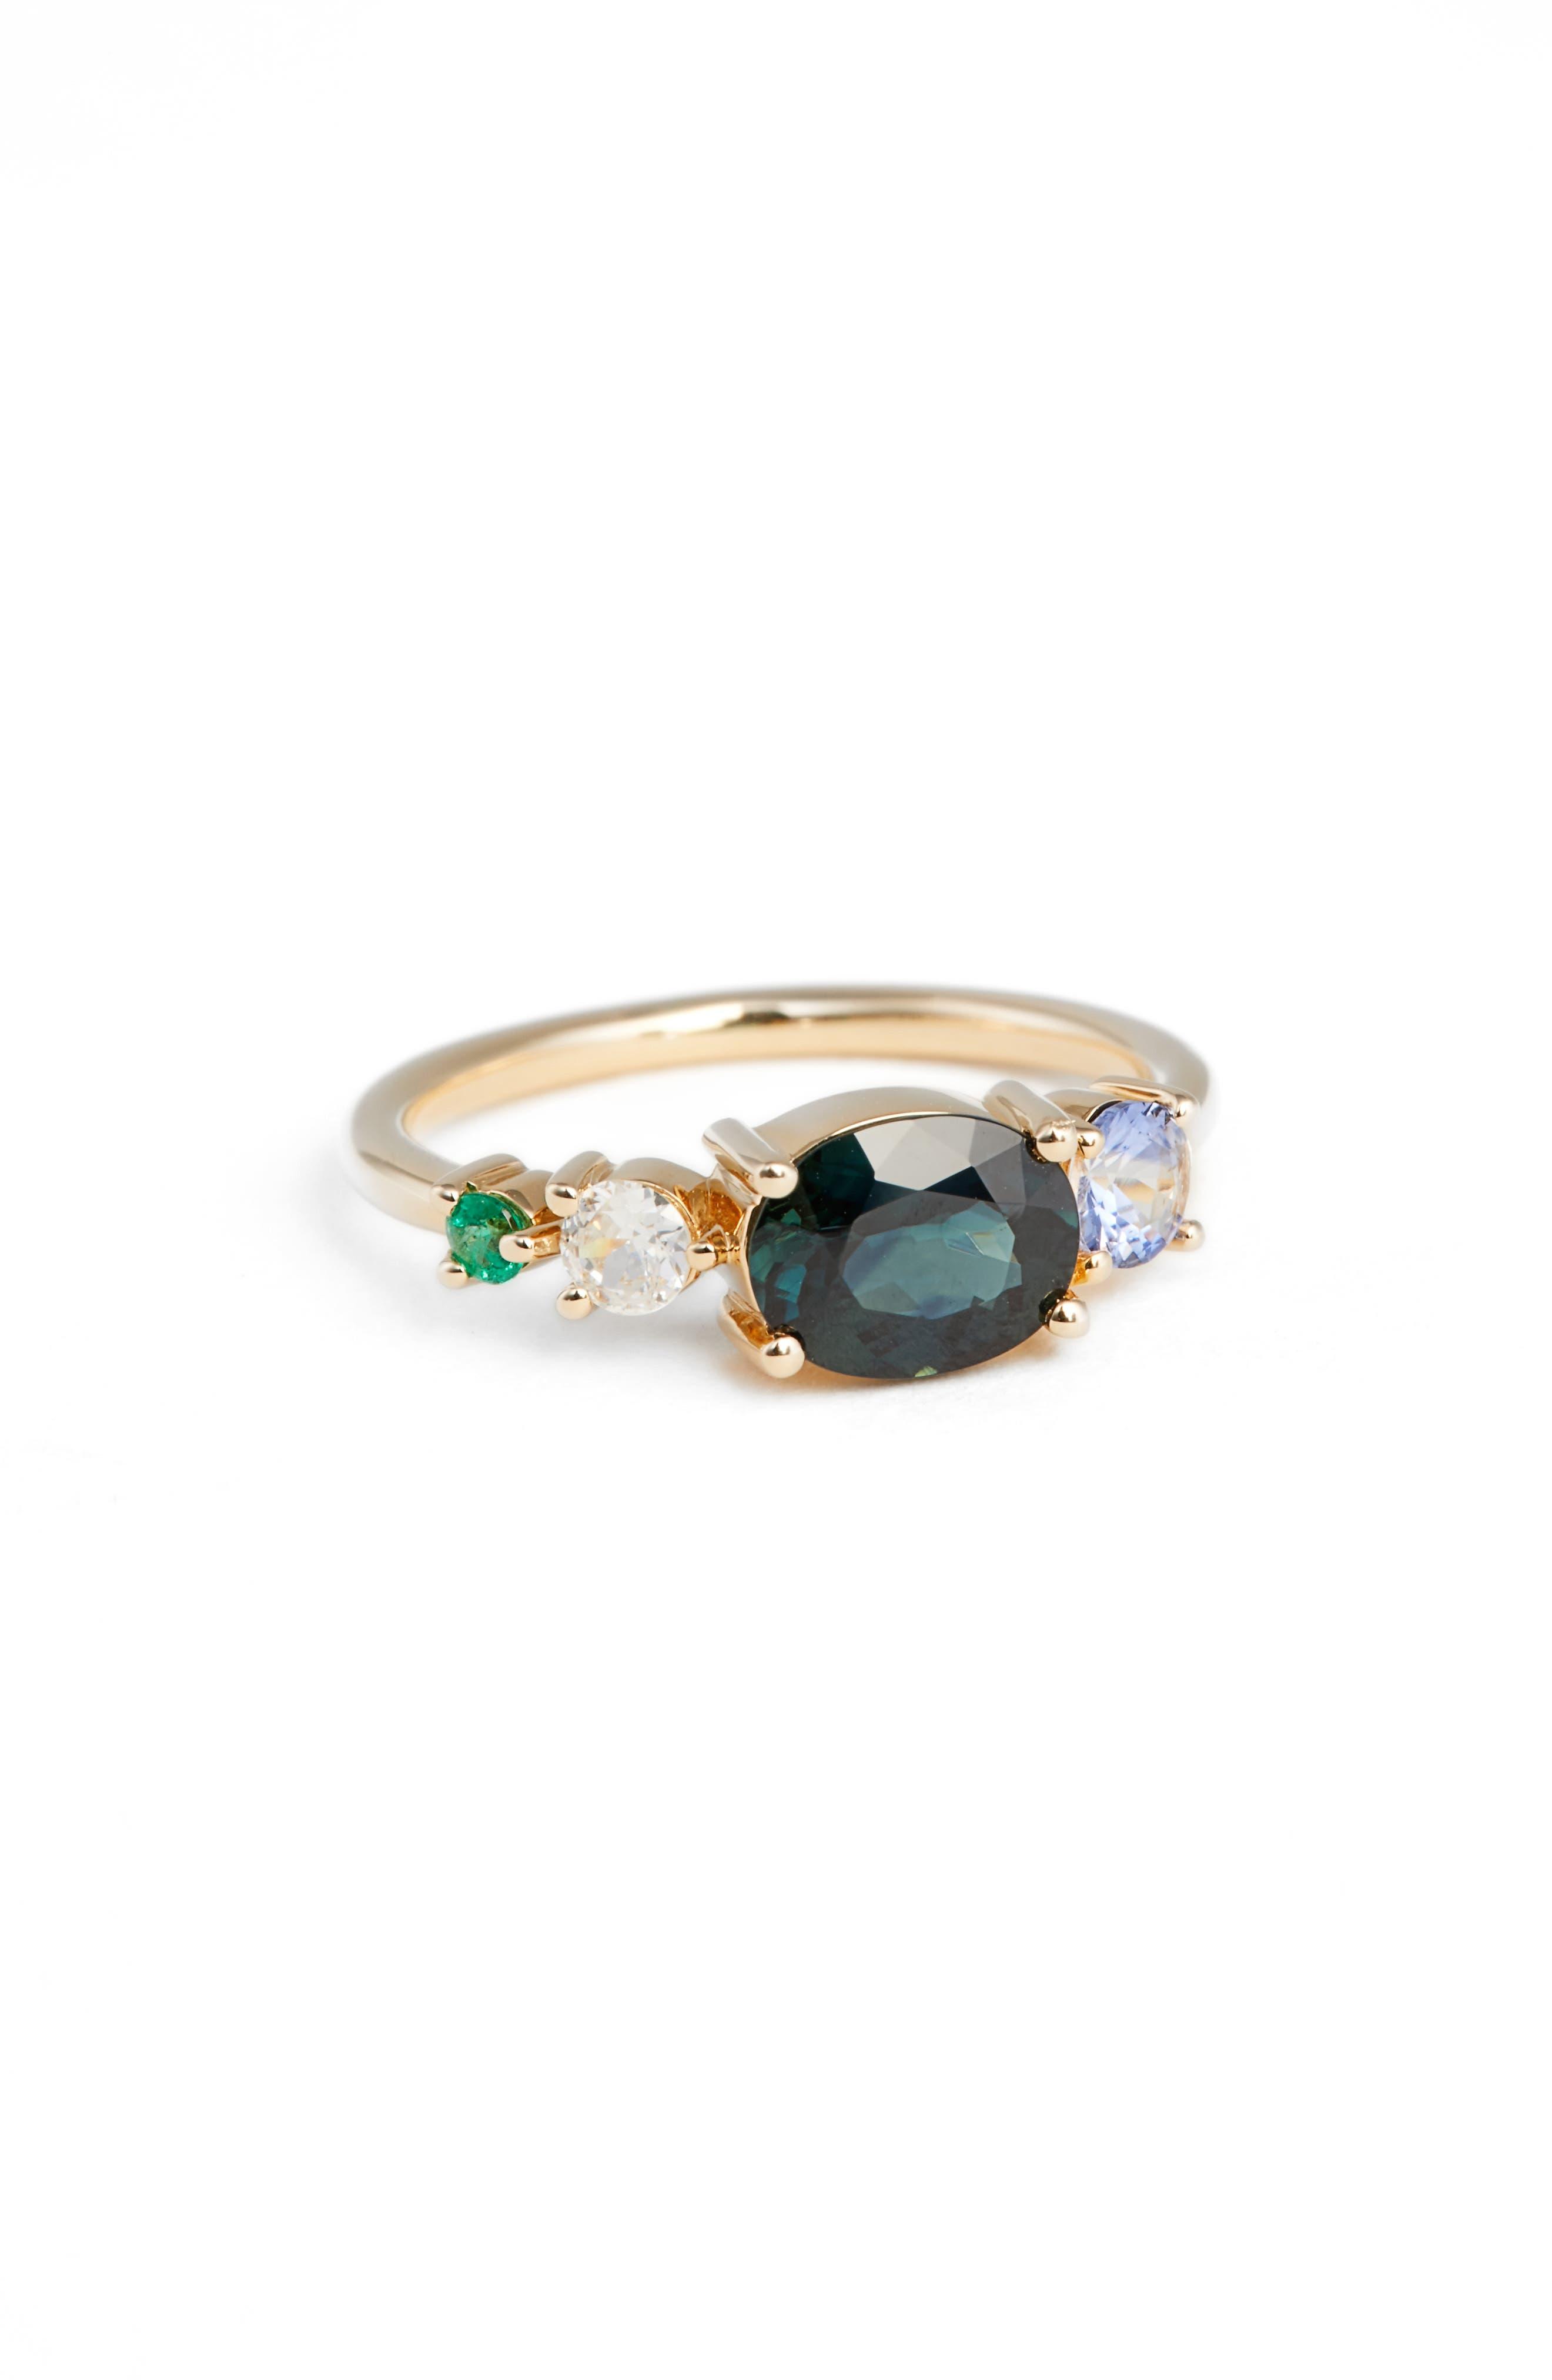 Main Image - Mociun Sapphire, Diamond & Emerald Ring